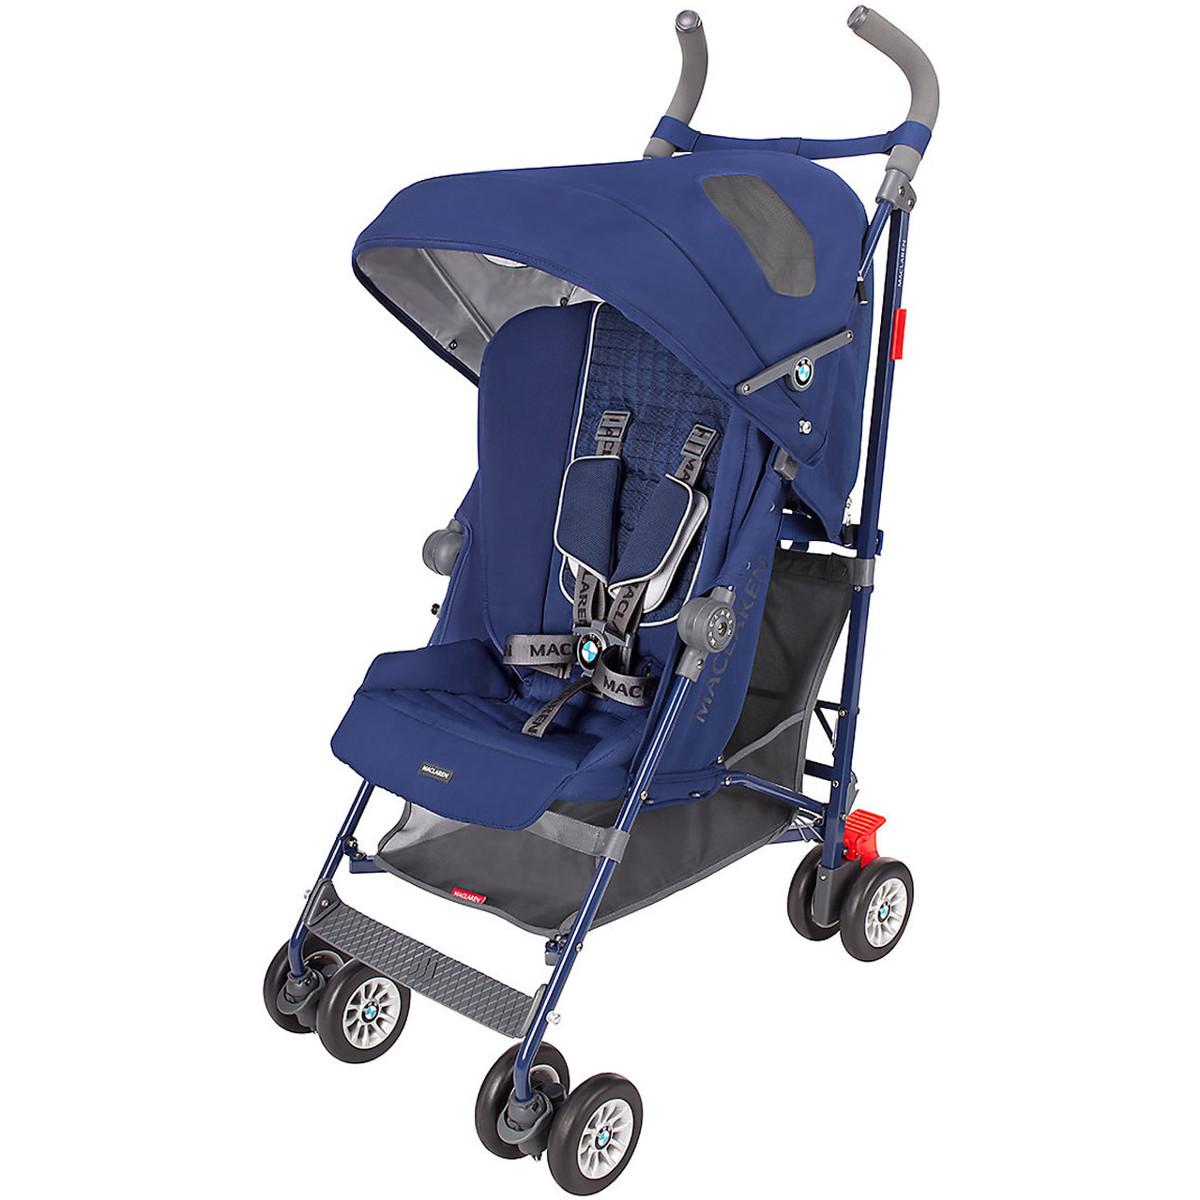 Maclaren BMW Buggy Stroller - Medieval Blue